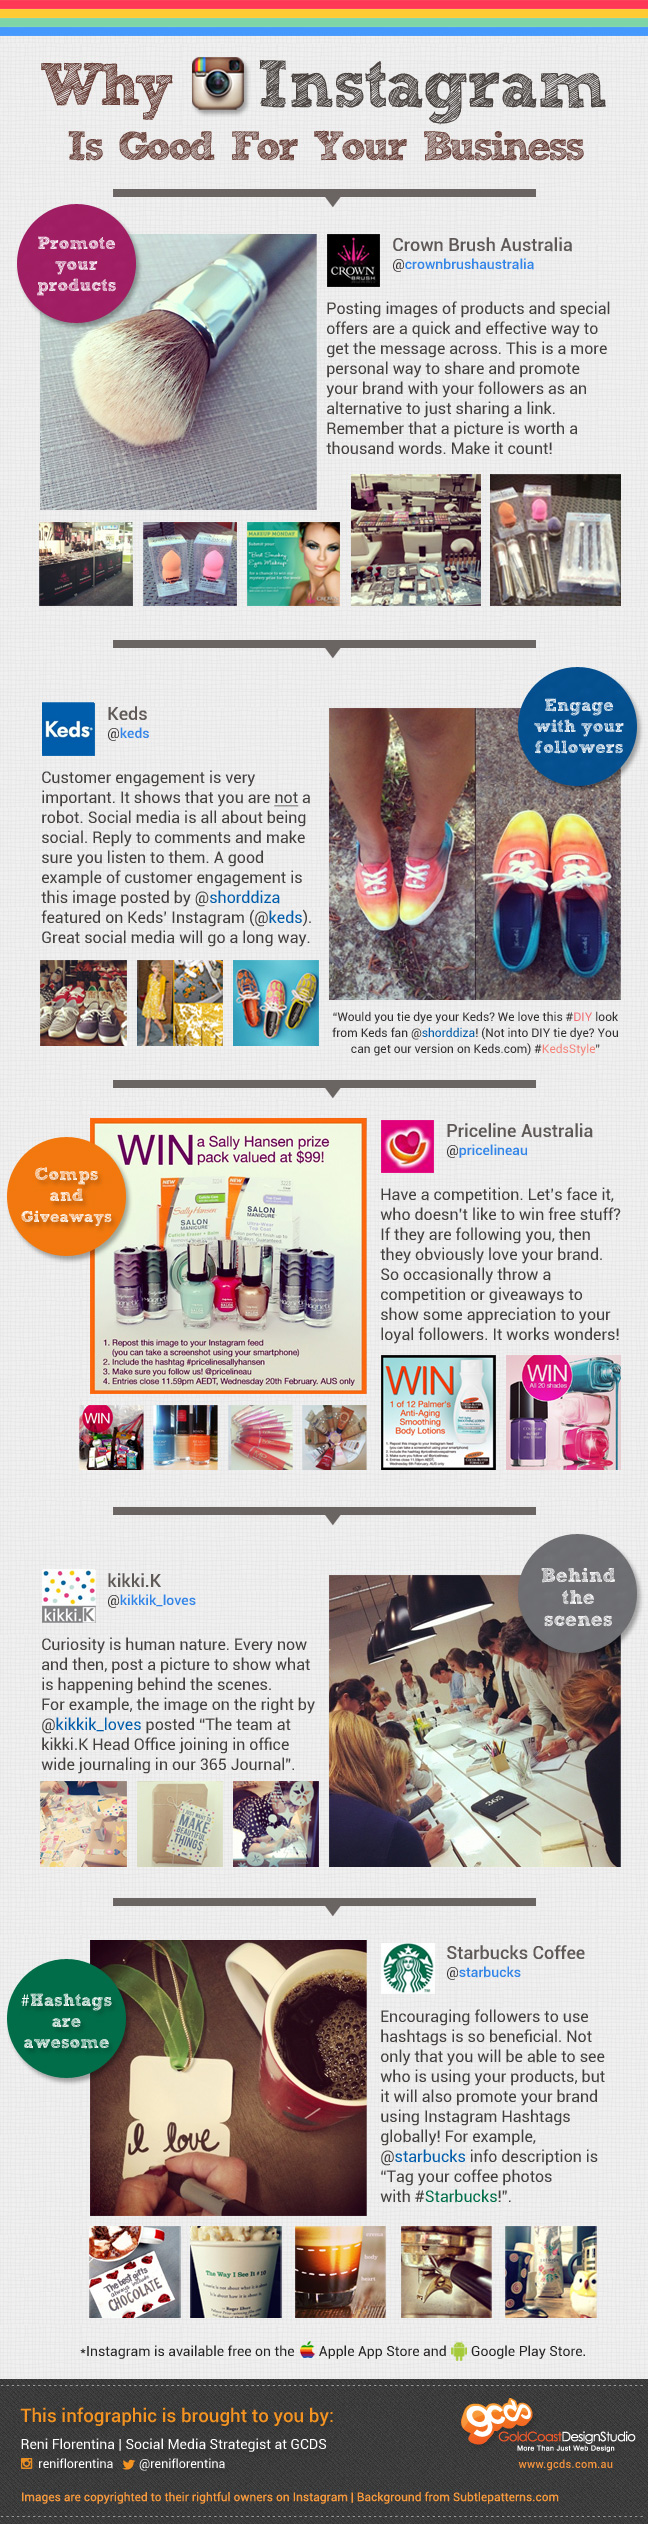 Instagram-Tips-for-Businesses